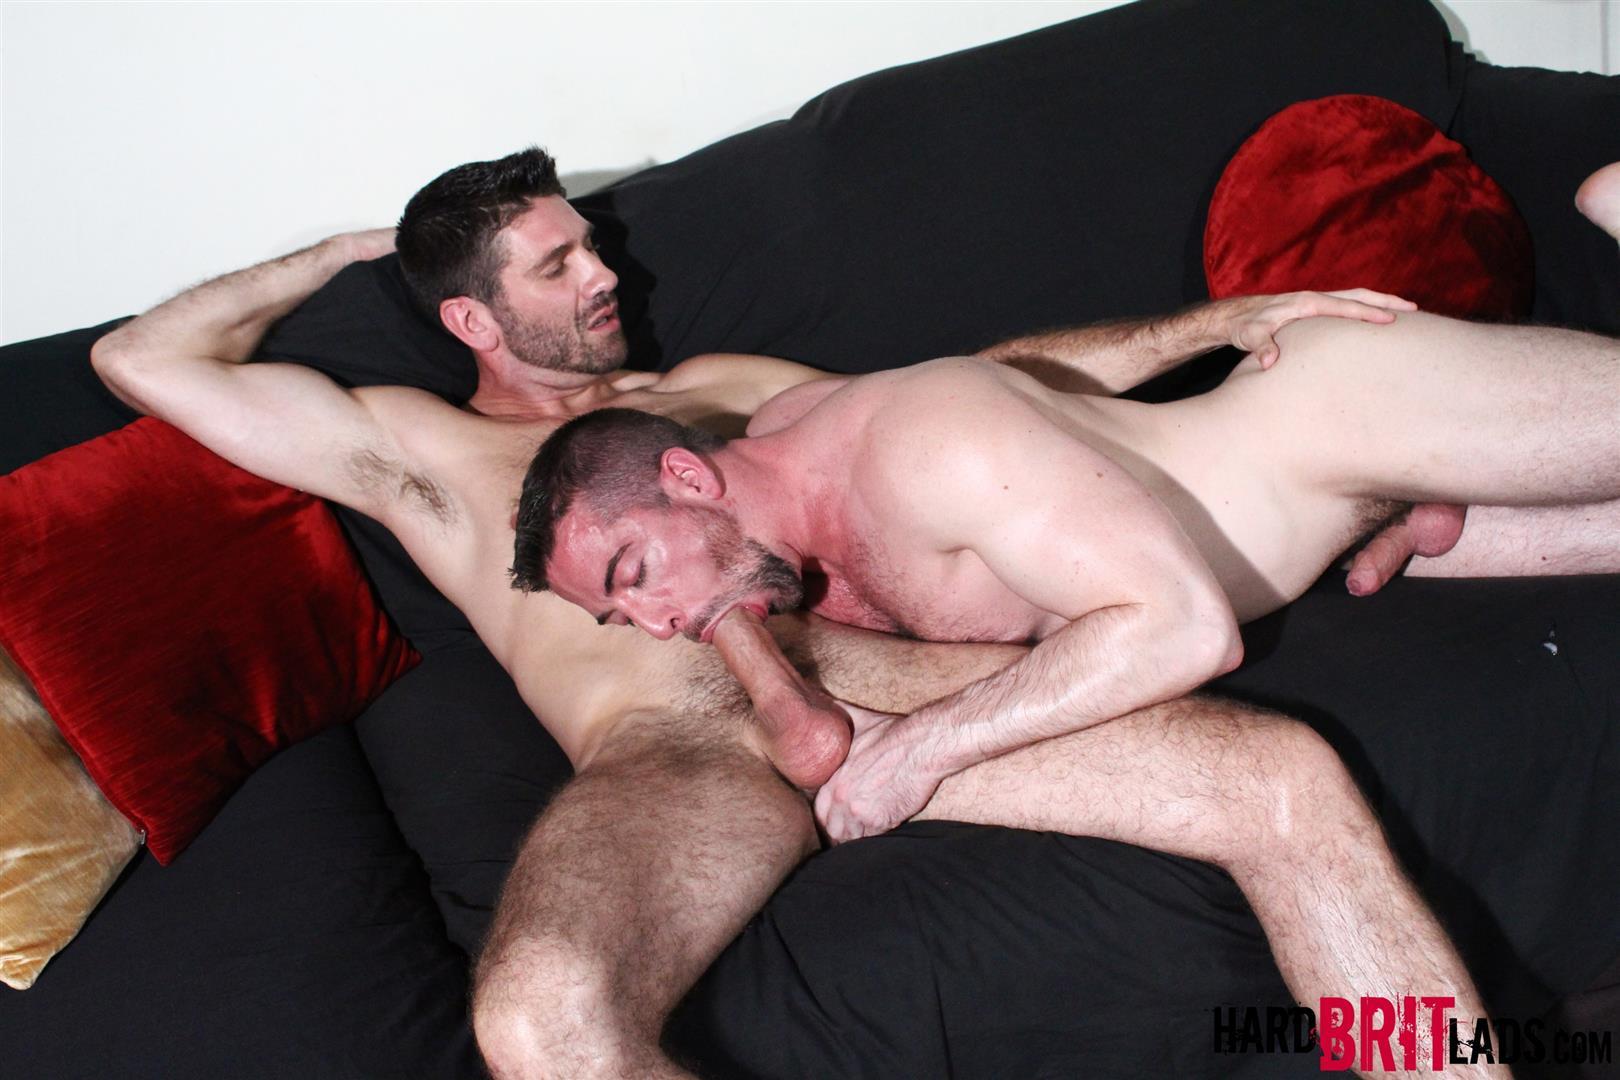 Hard-Brit-Lads-Craig-Daniel-Scott-Hunter-Hairy-Muscle-Hunks-With-Big-Uncut-Cocks-Fucking-Amateur-Gay-Porn-10 Hairy Muscle Hunks Fucking And Eating Cum From Big Uncut Cocks